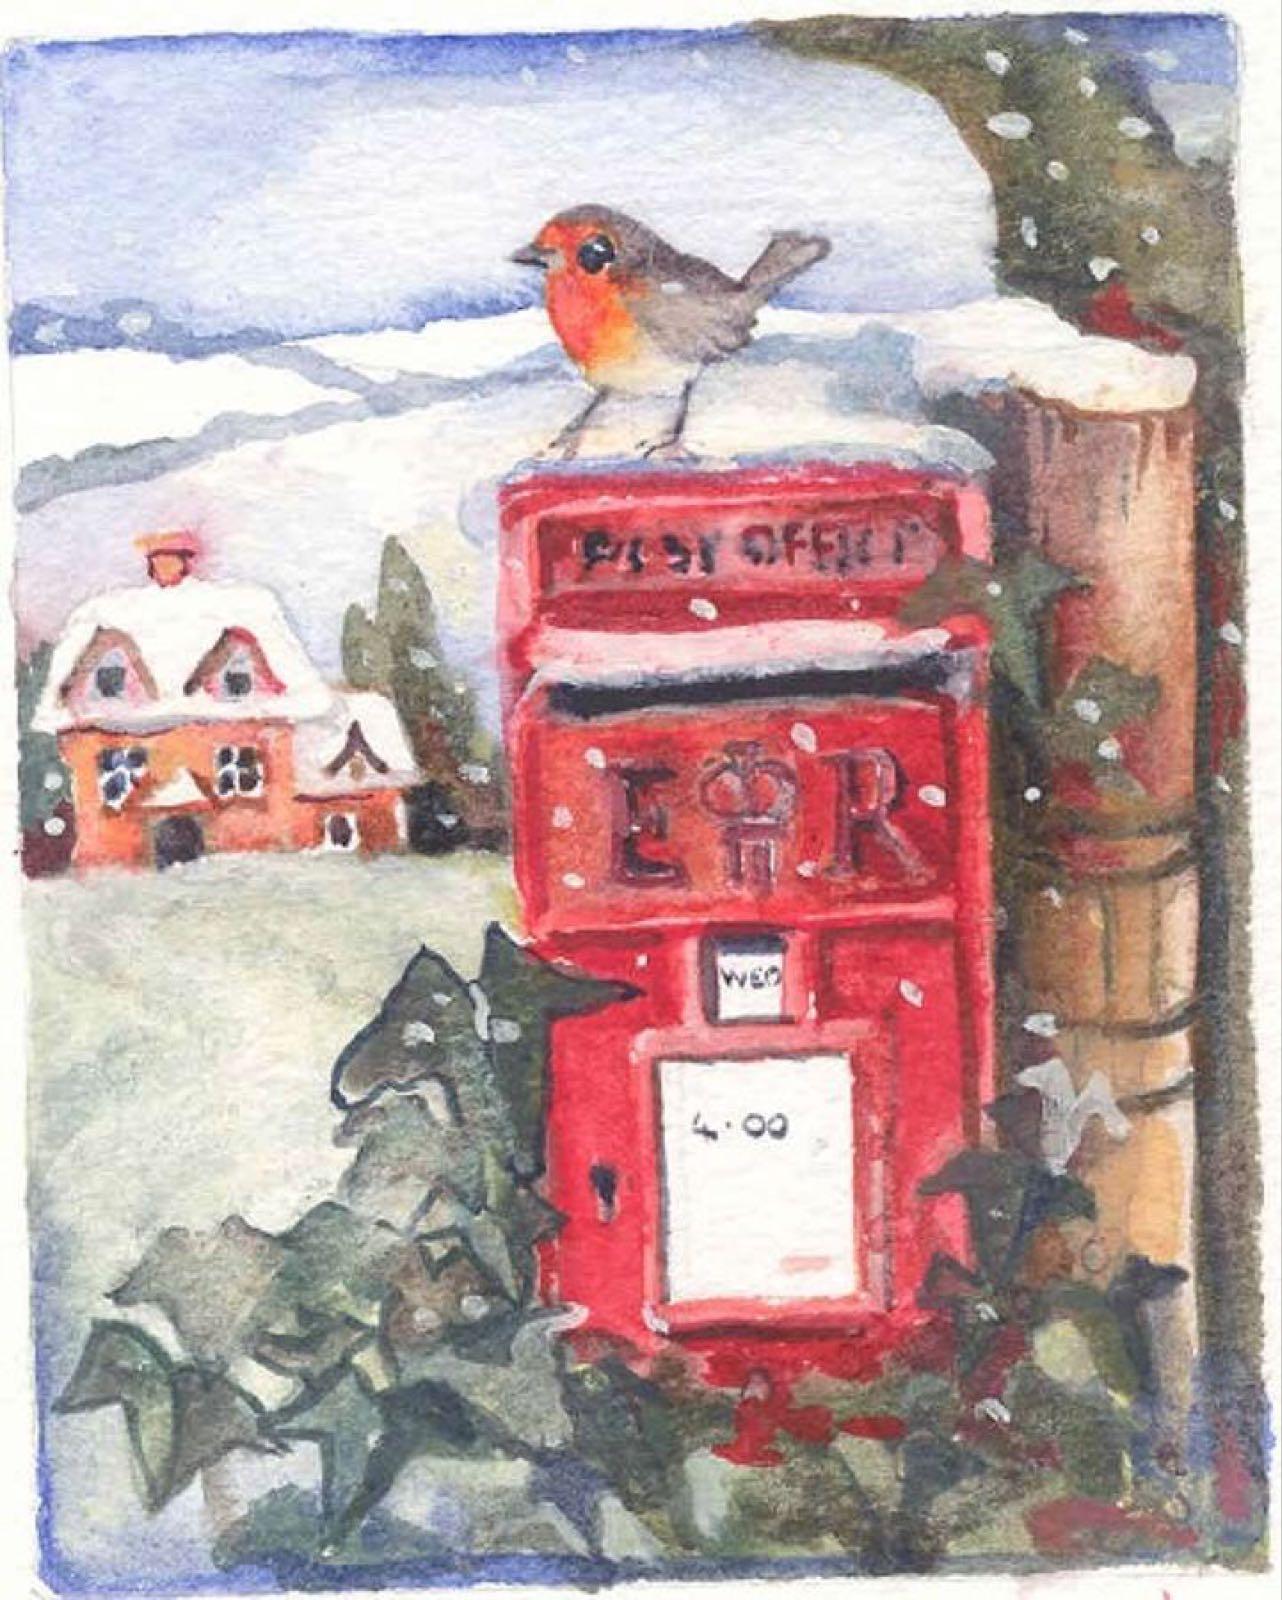 'Robin & Letterbox' Furzedown Gallery Mini Card